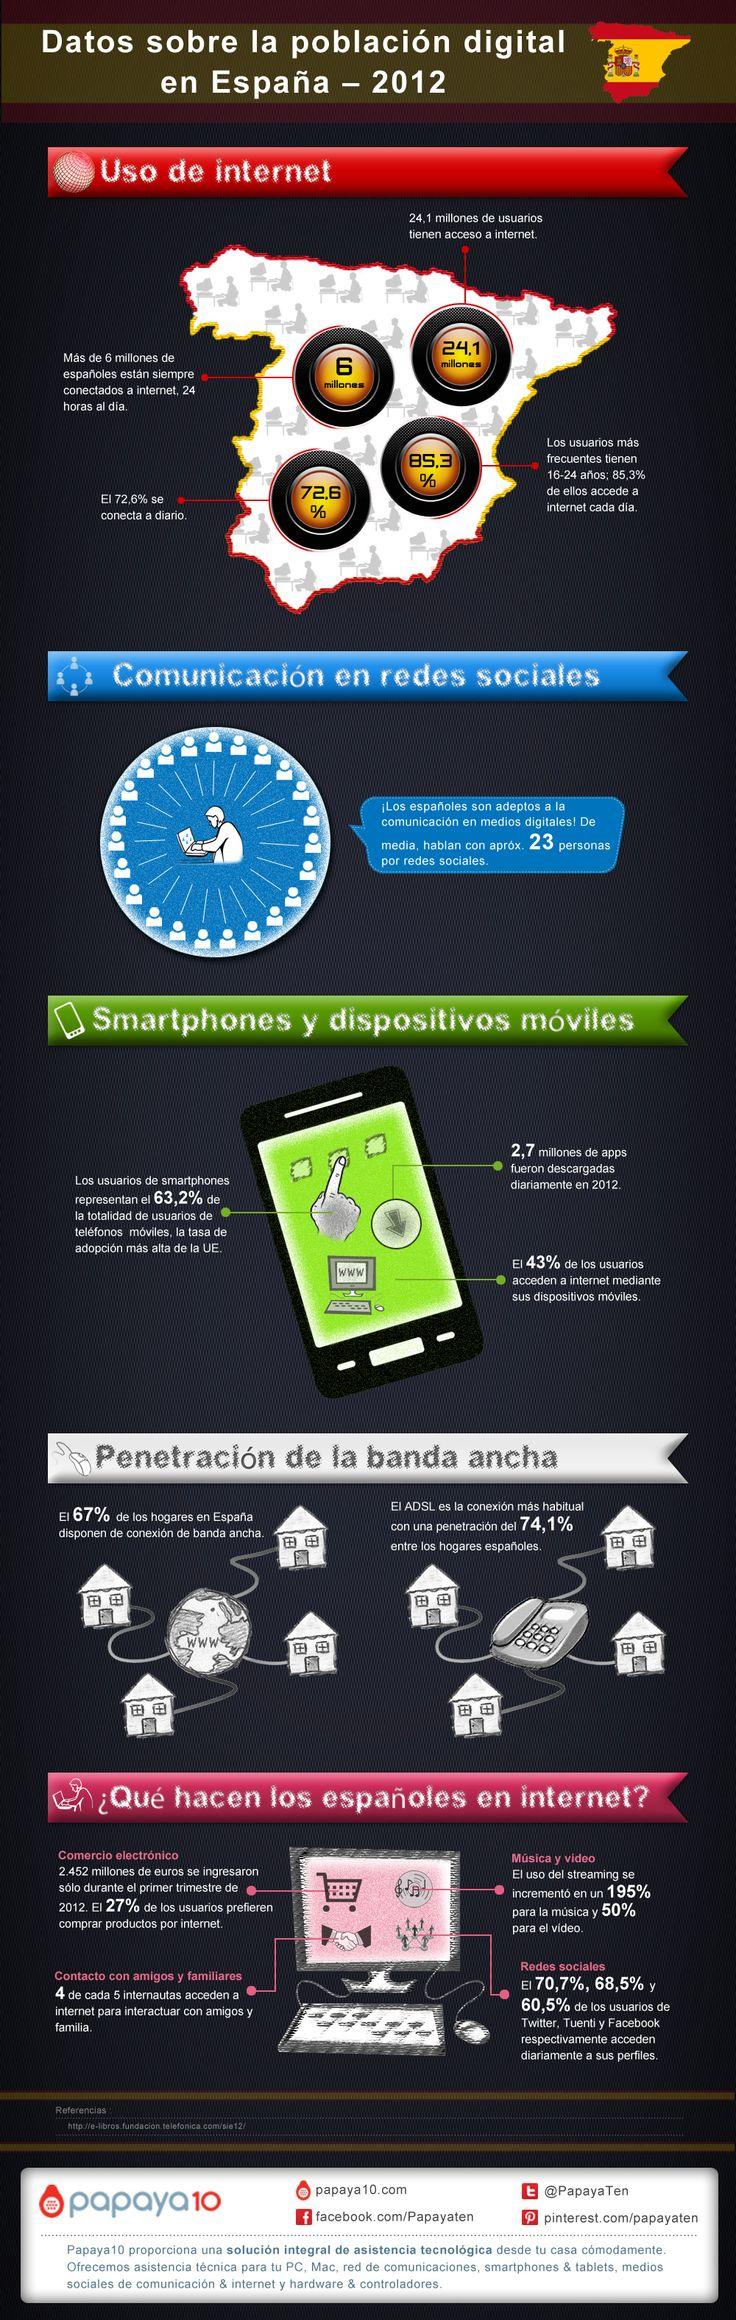 Uso de internet en España en 2012